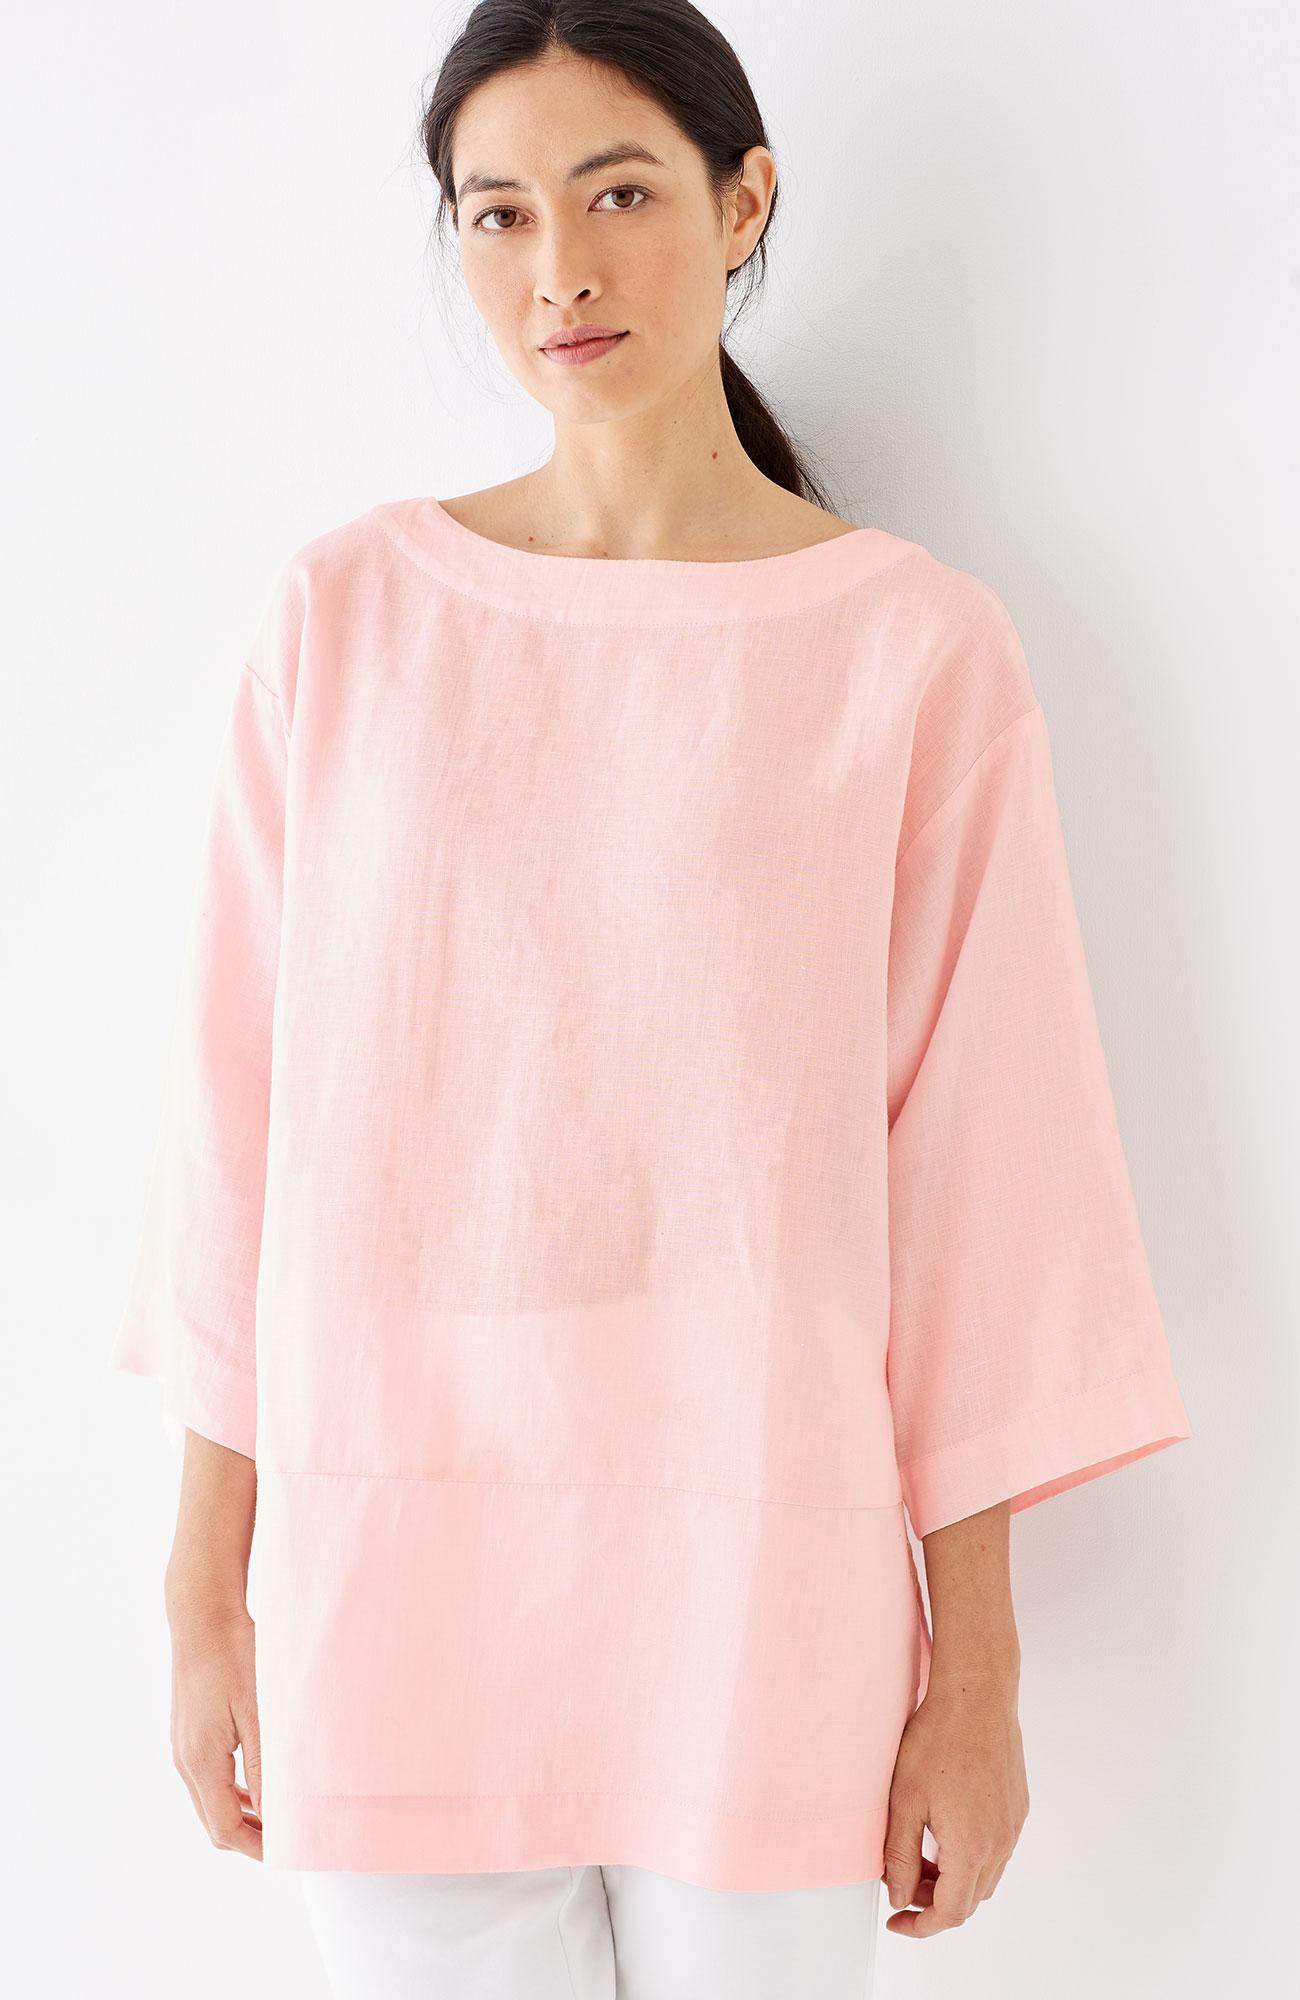 Pure Jill linen kimono tunic